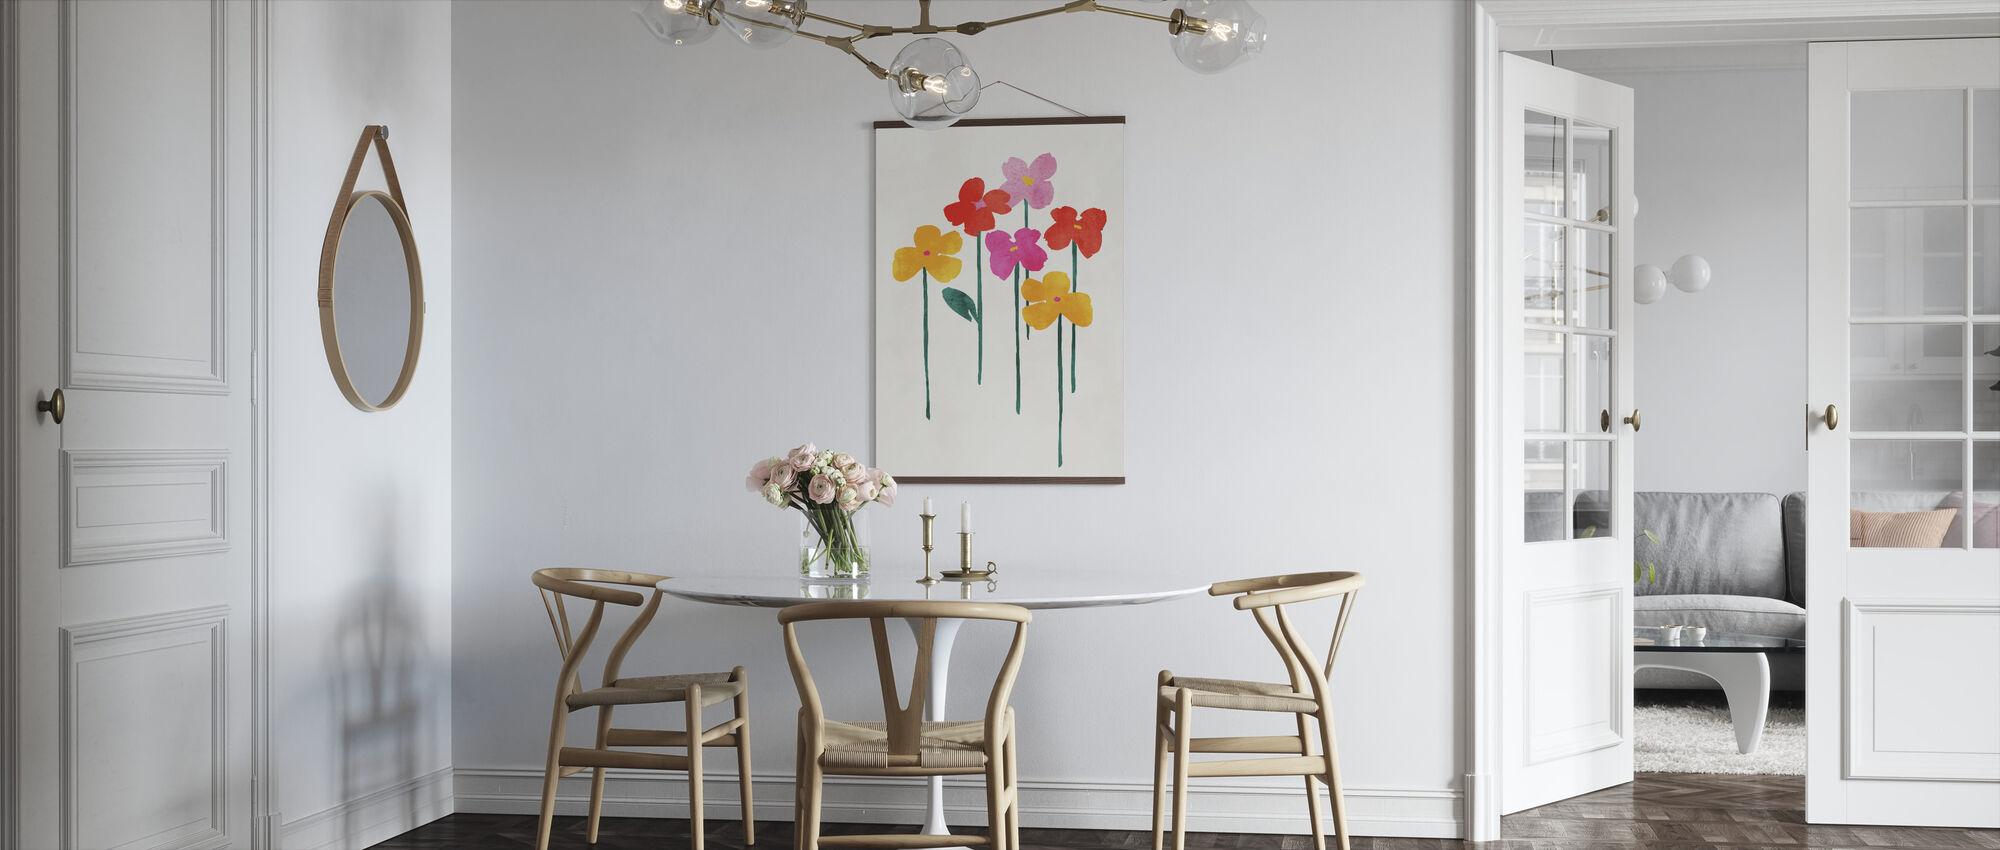 Little Happy Flowers - Poster - Kitchen